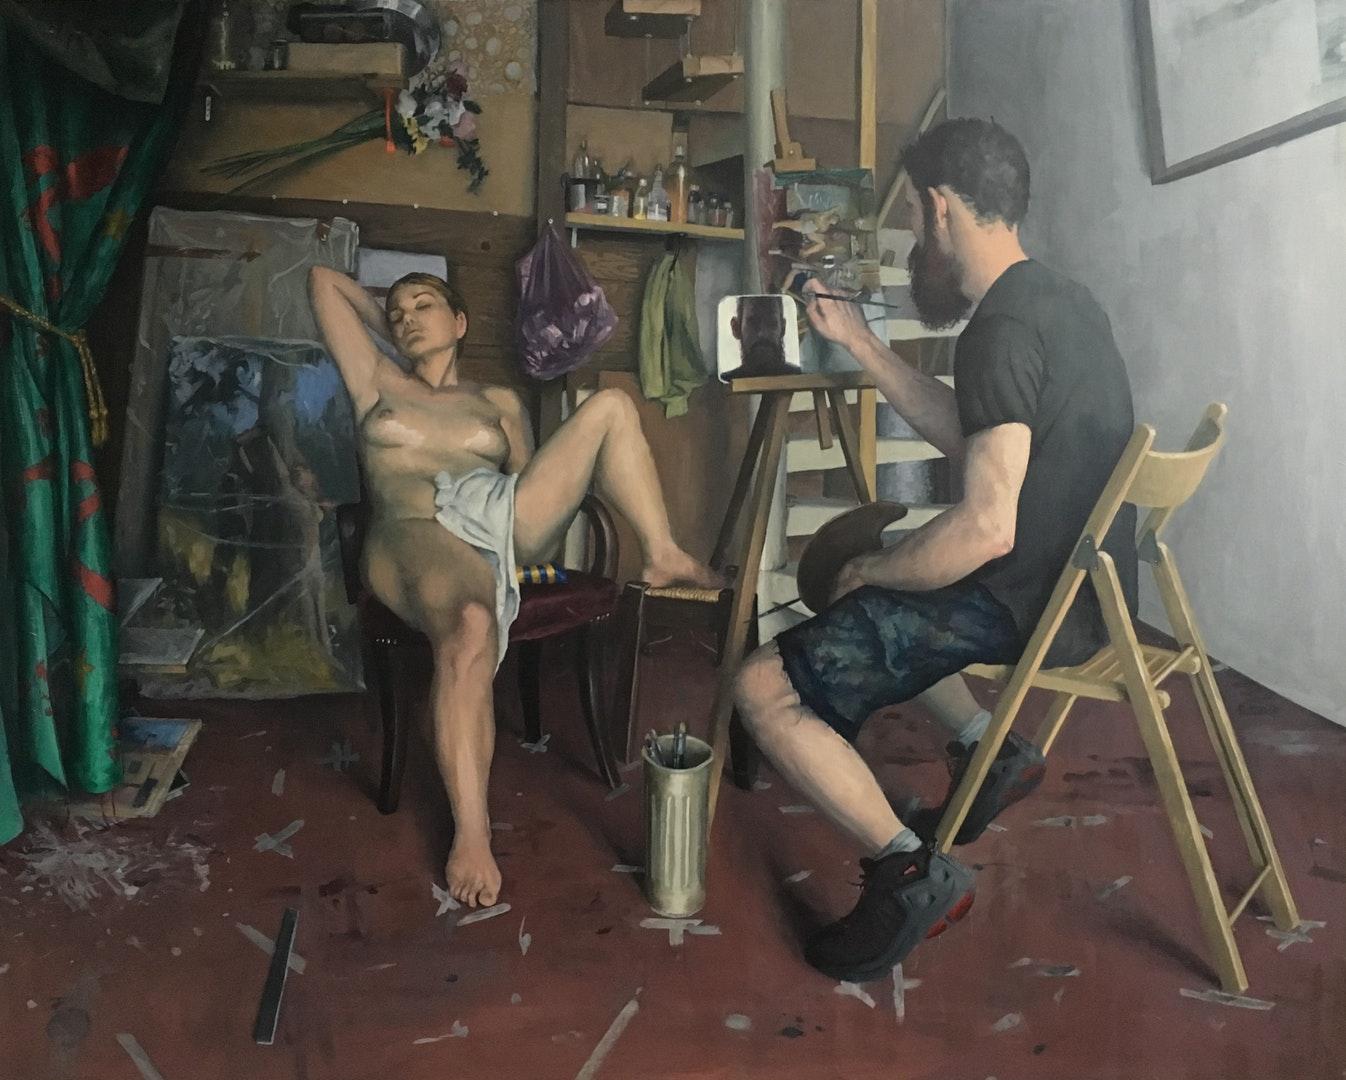 'Venus comes to visit my studio', Sam Rahamin, Oil on wood, 113 x 133 x 7 cm